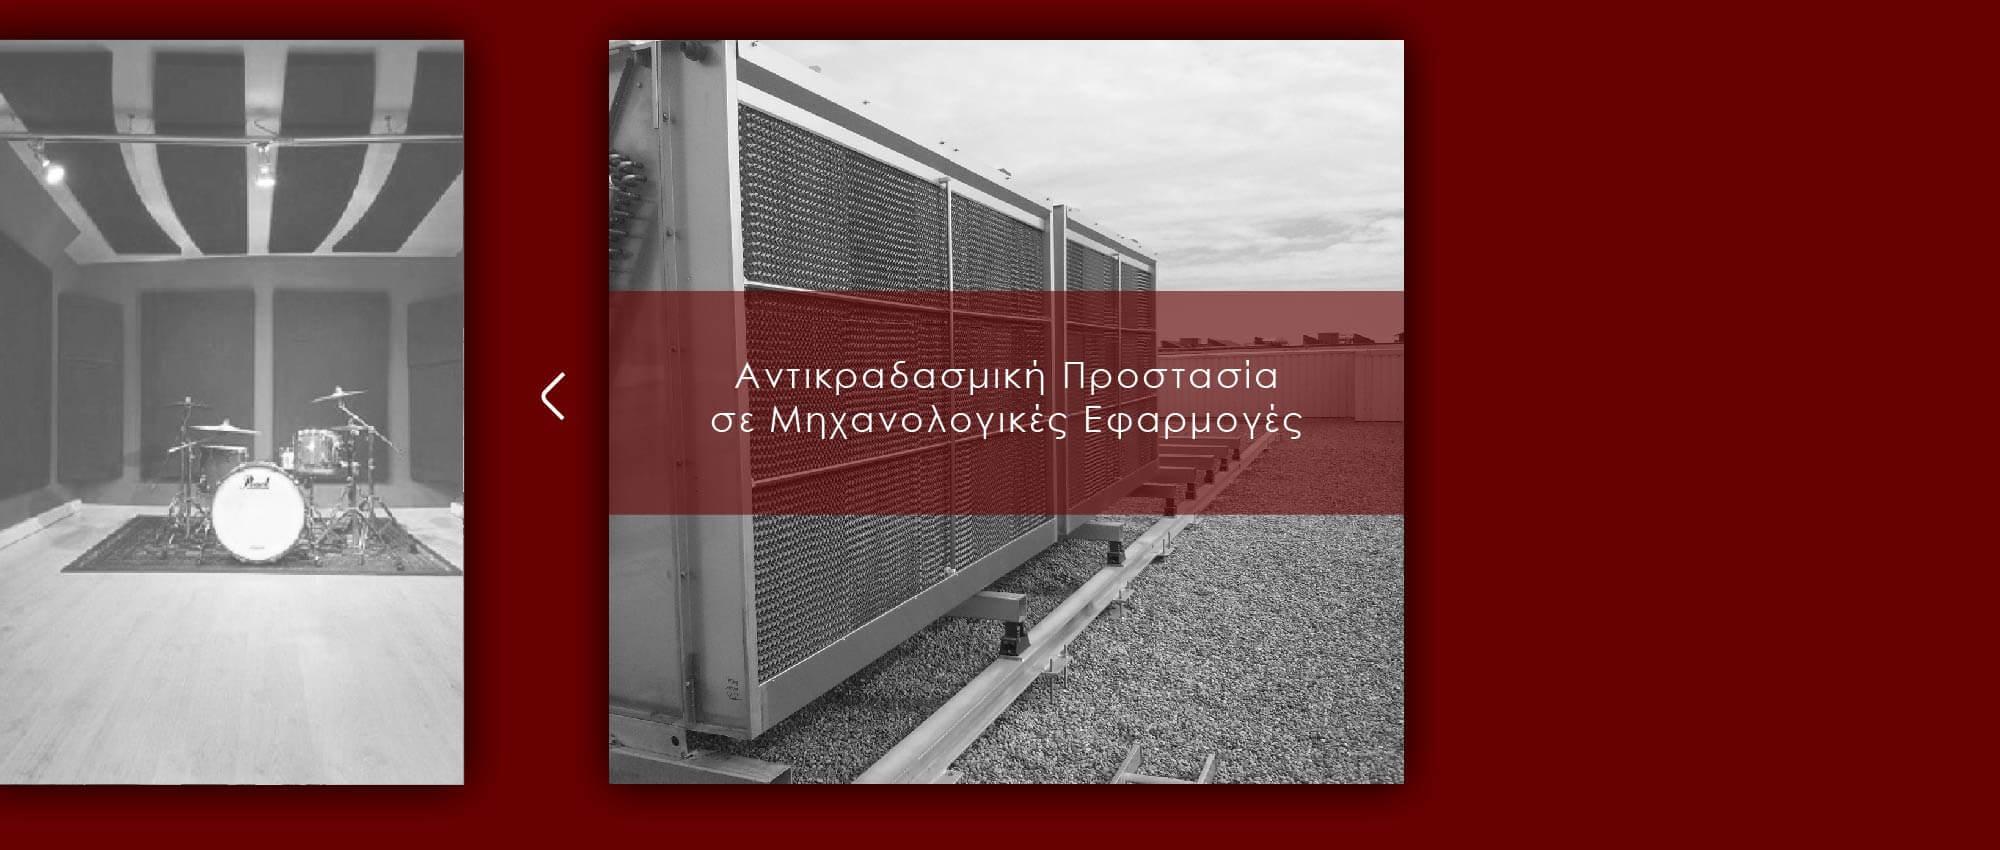 antivibration-systems-Αντικραδασμικά Μηχανολογικών Εφαρμογών